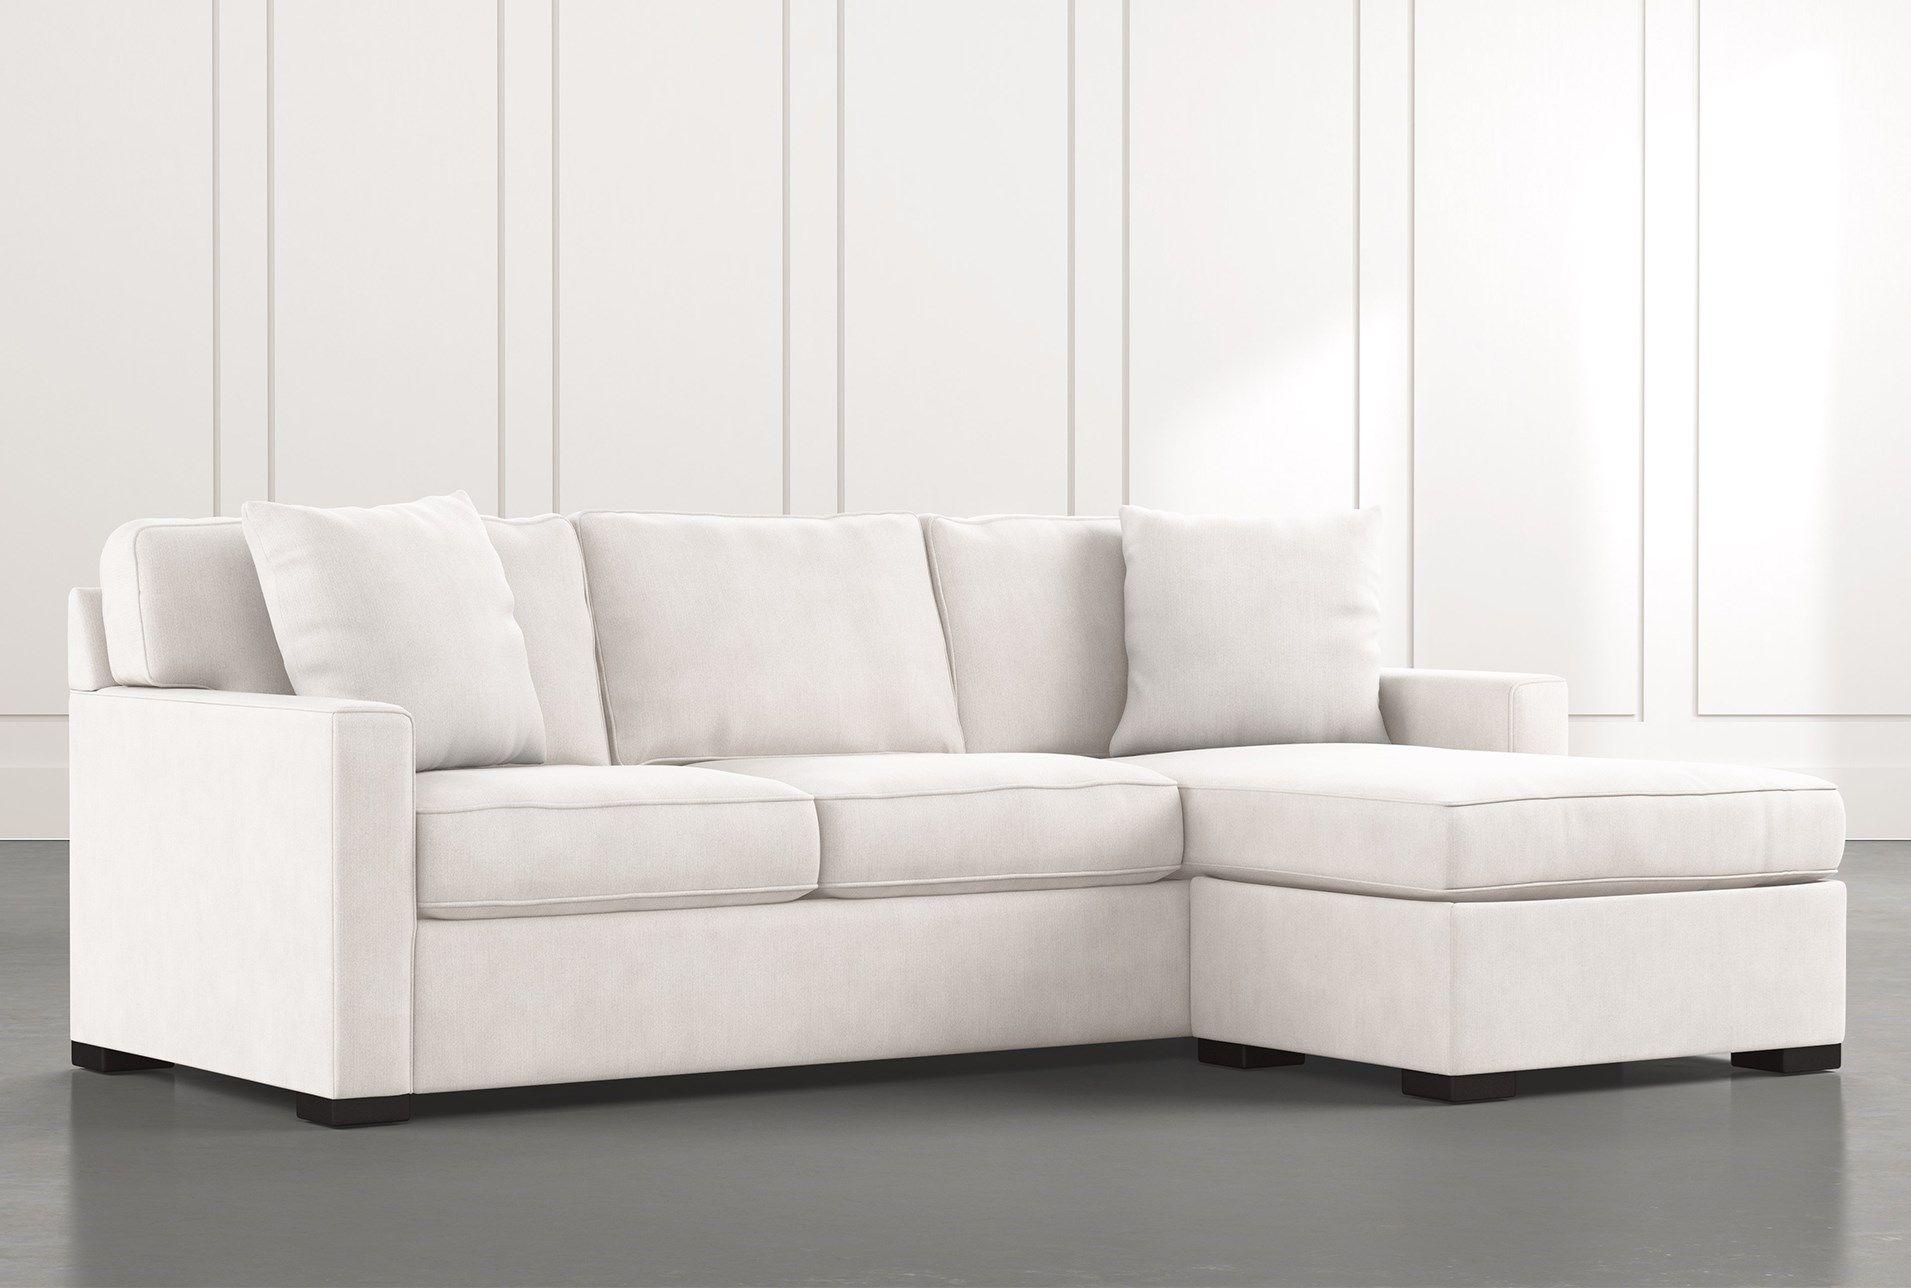 Sofa Chaise Sleeper W Storage Ottoman